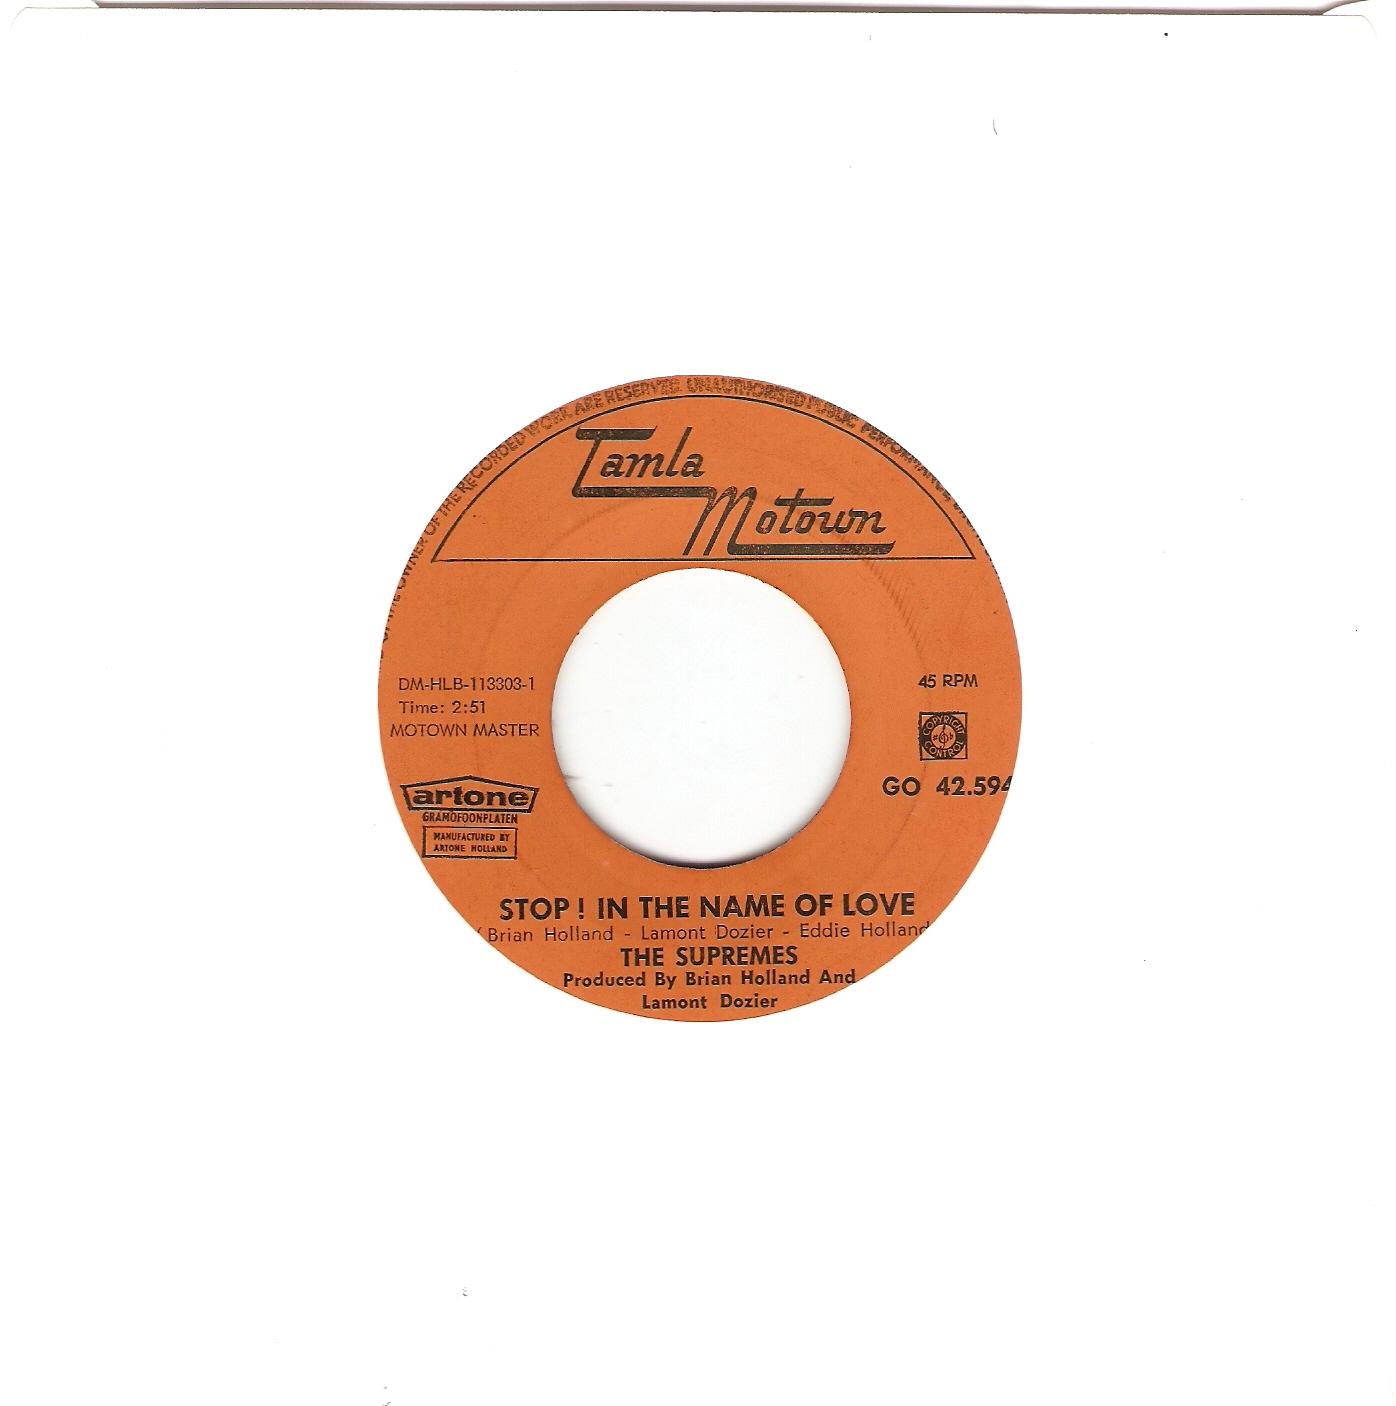 motown nhd 【送料無料】ここが噂のエル・パラシオ dvd-box (dvd)[5枚組] 【送料無料】va / complete motown singles 11a: 1971 (輸入盤cd) 【★】【割引中】 knock out.